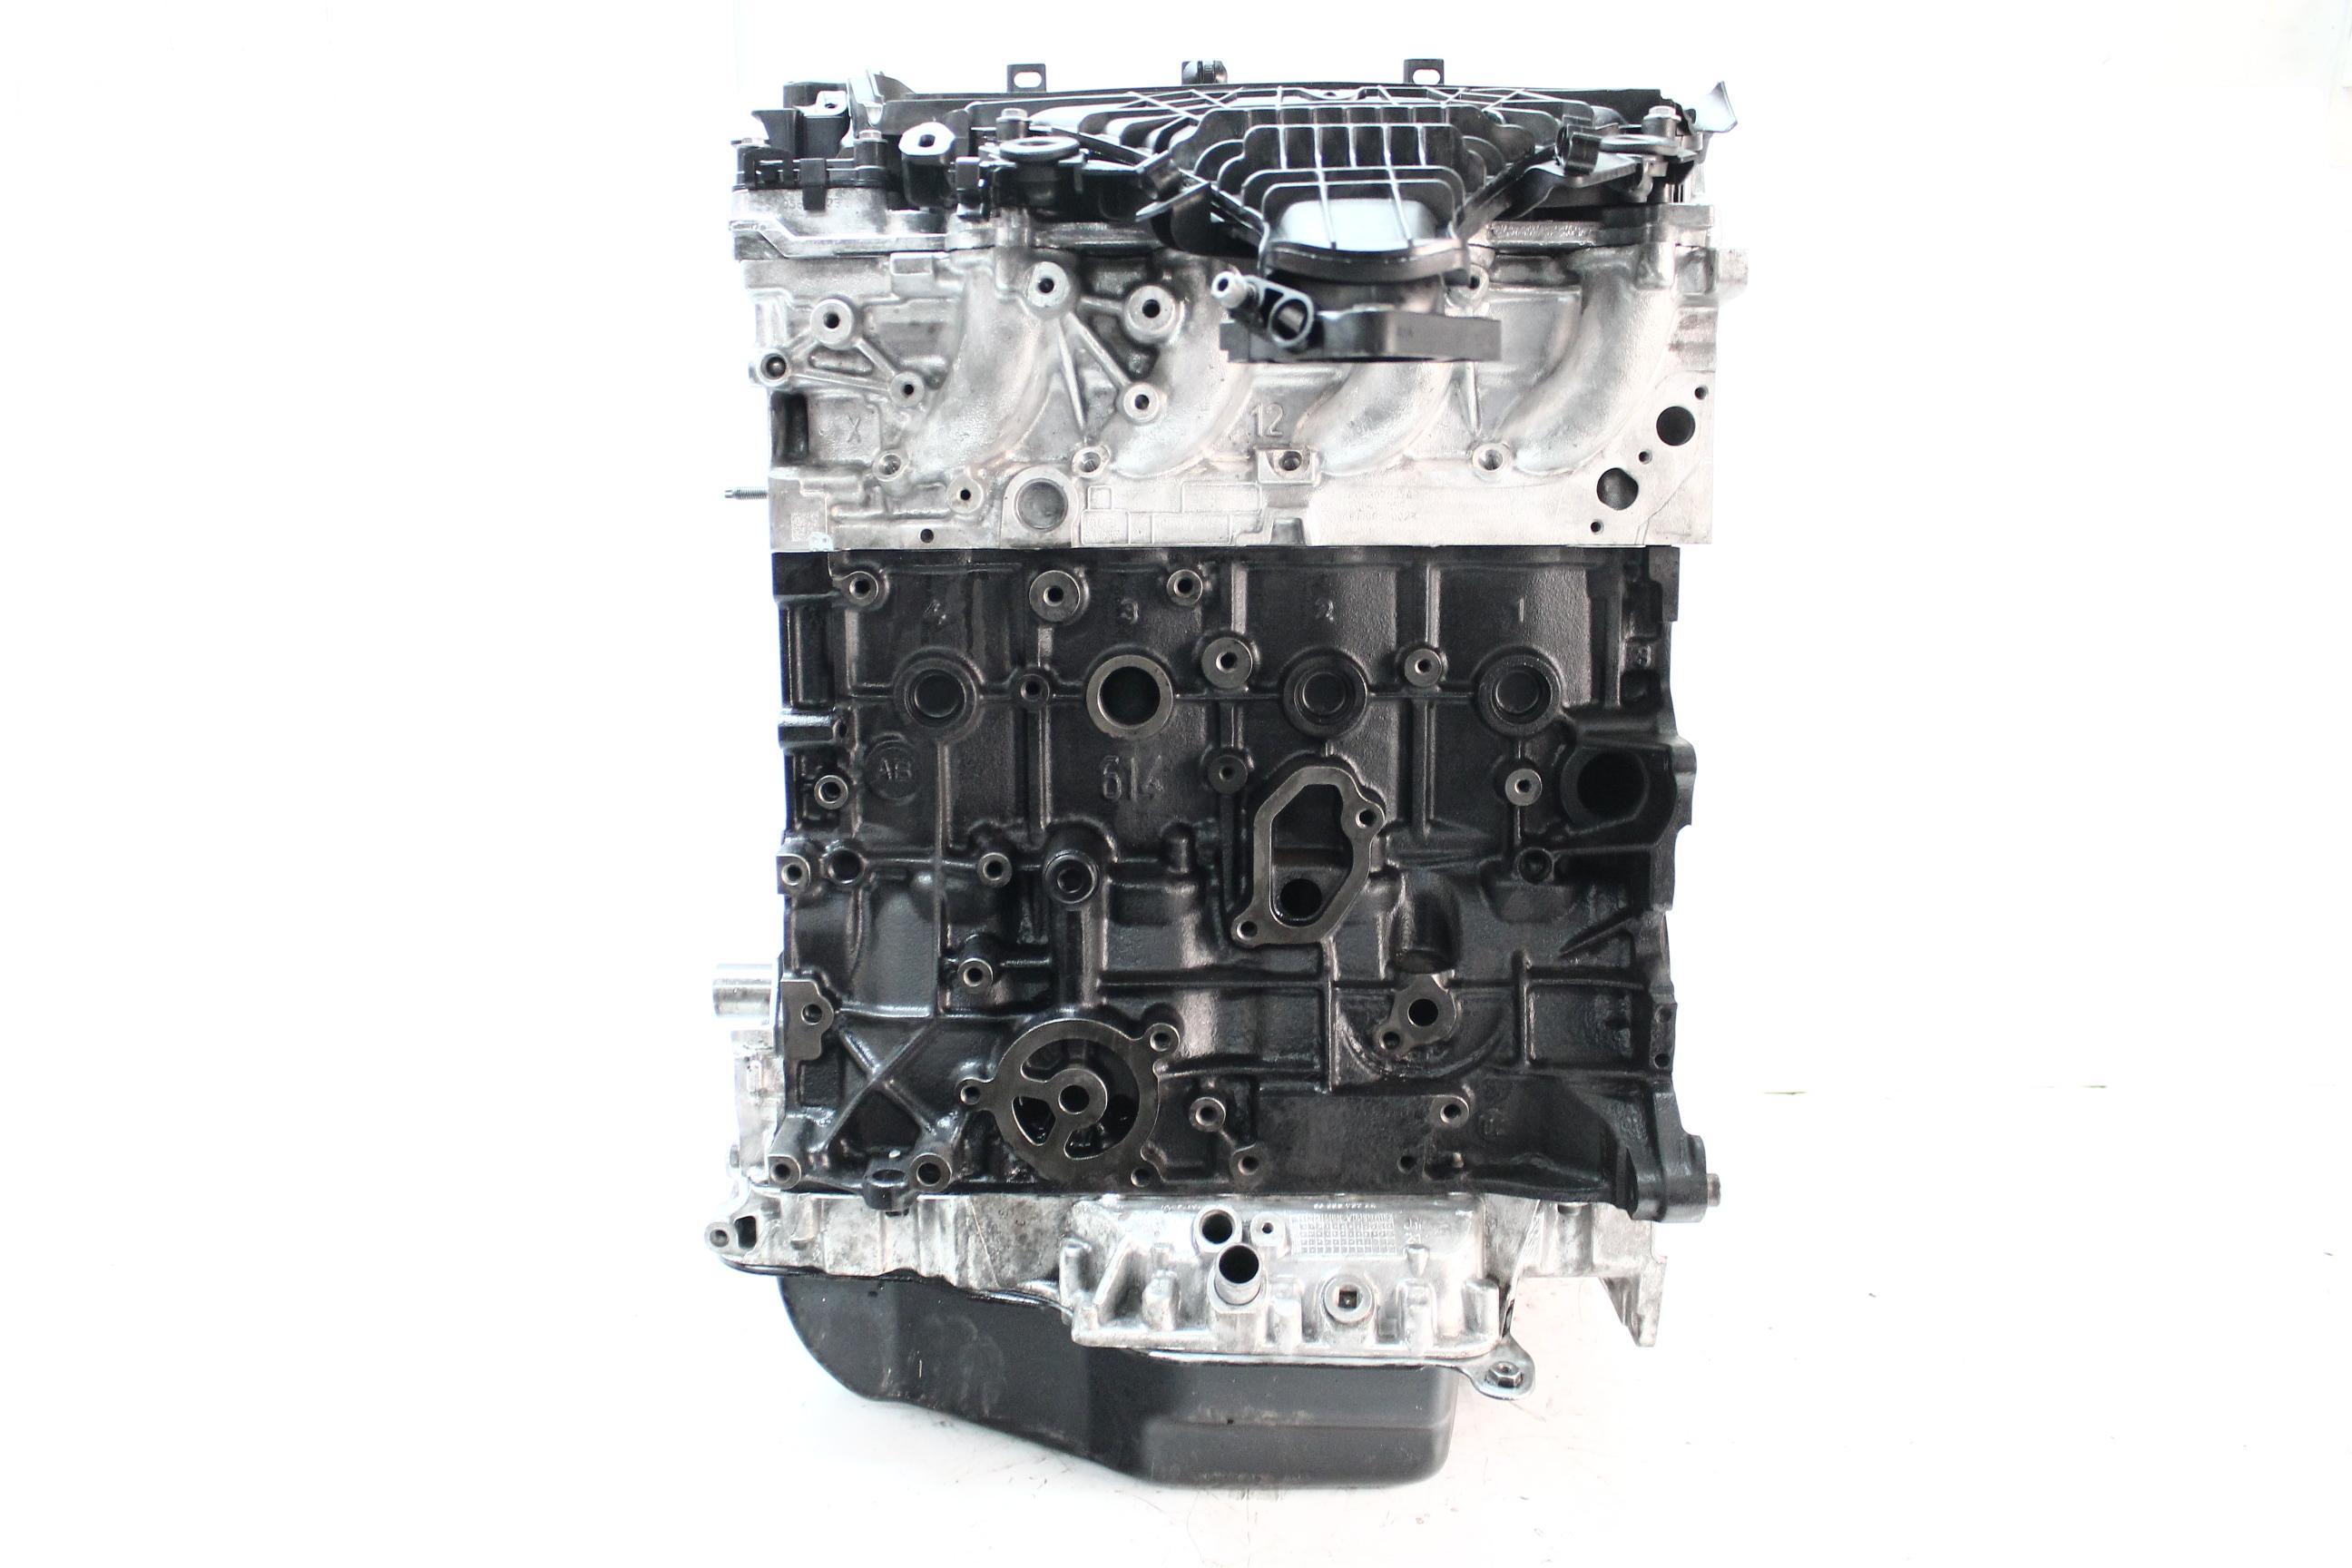 Motor 2010 Ford Kuga I 2,0 TDCi Diesel UFDA 140 PS Kopf geplant Dichtung NEU